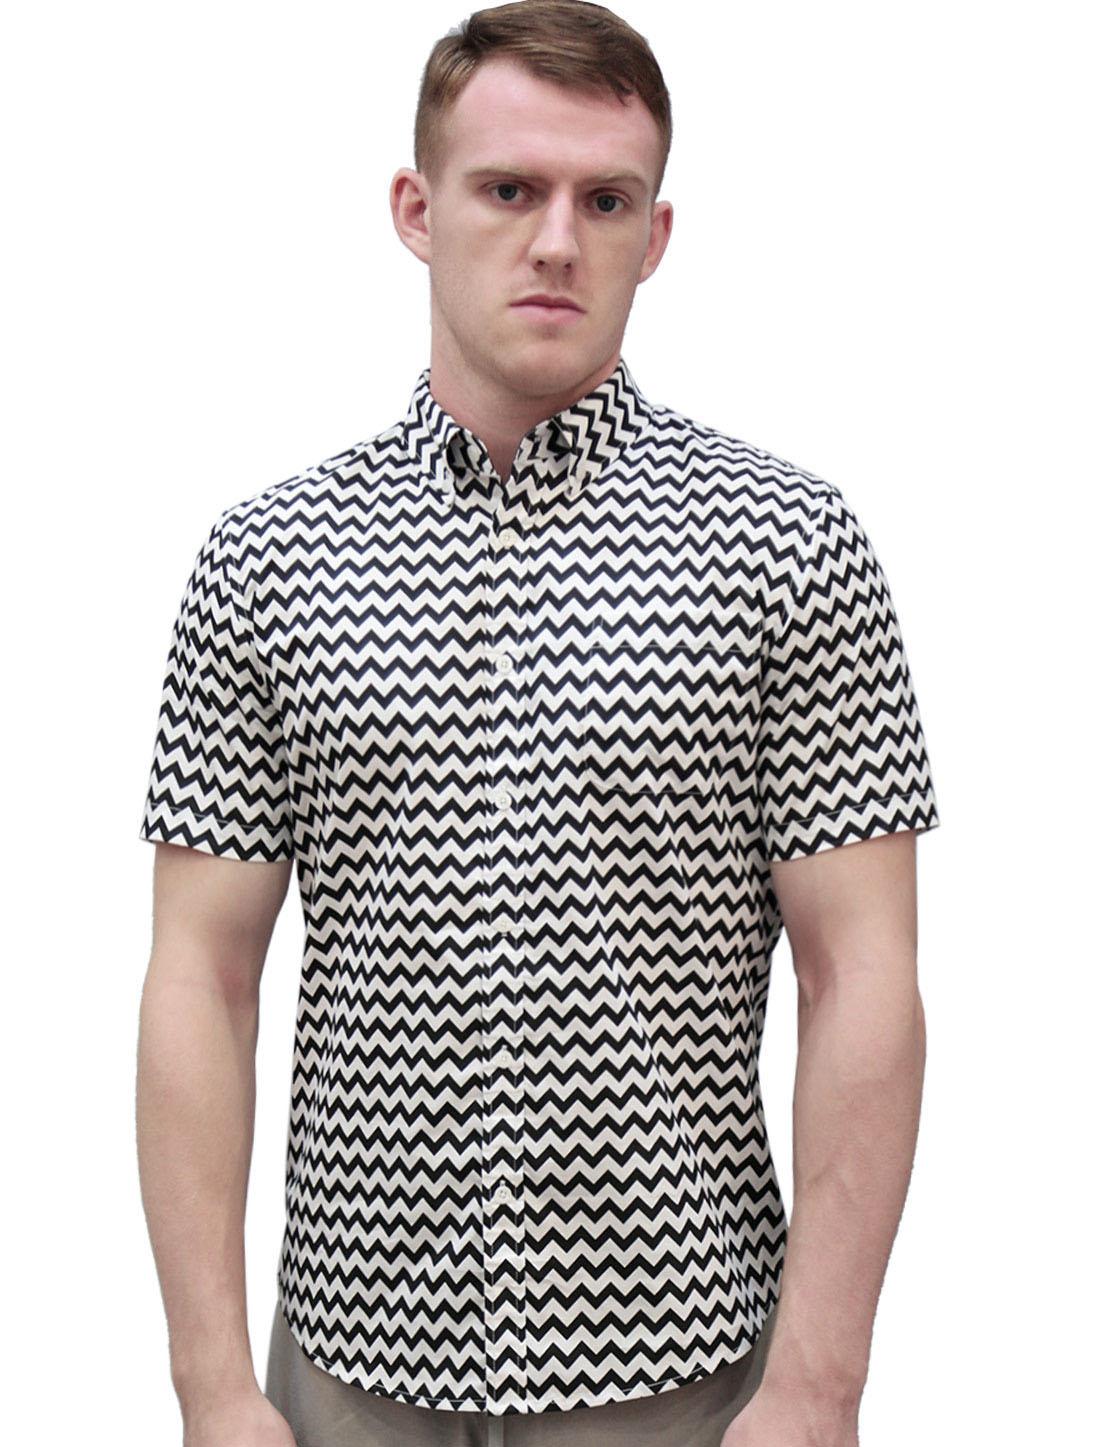 Men Zigzag Print Short Sleeves Button Down Shirt Black White L